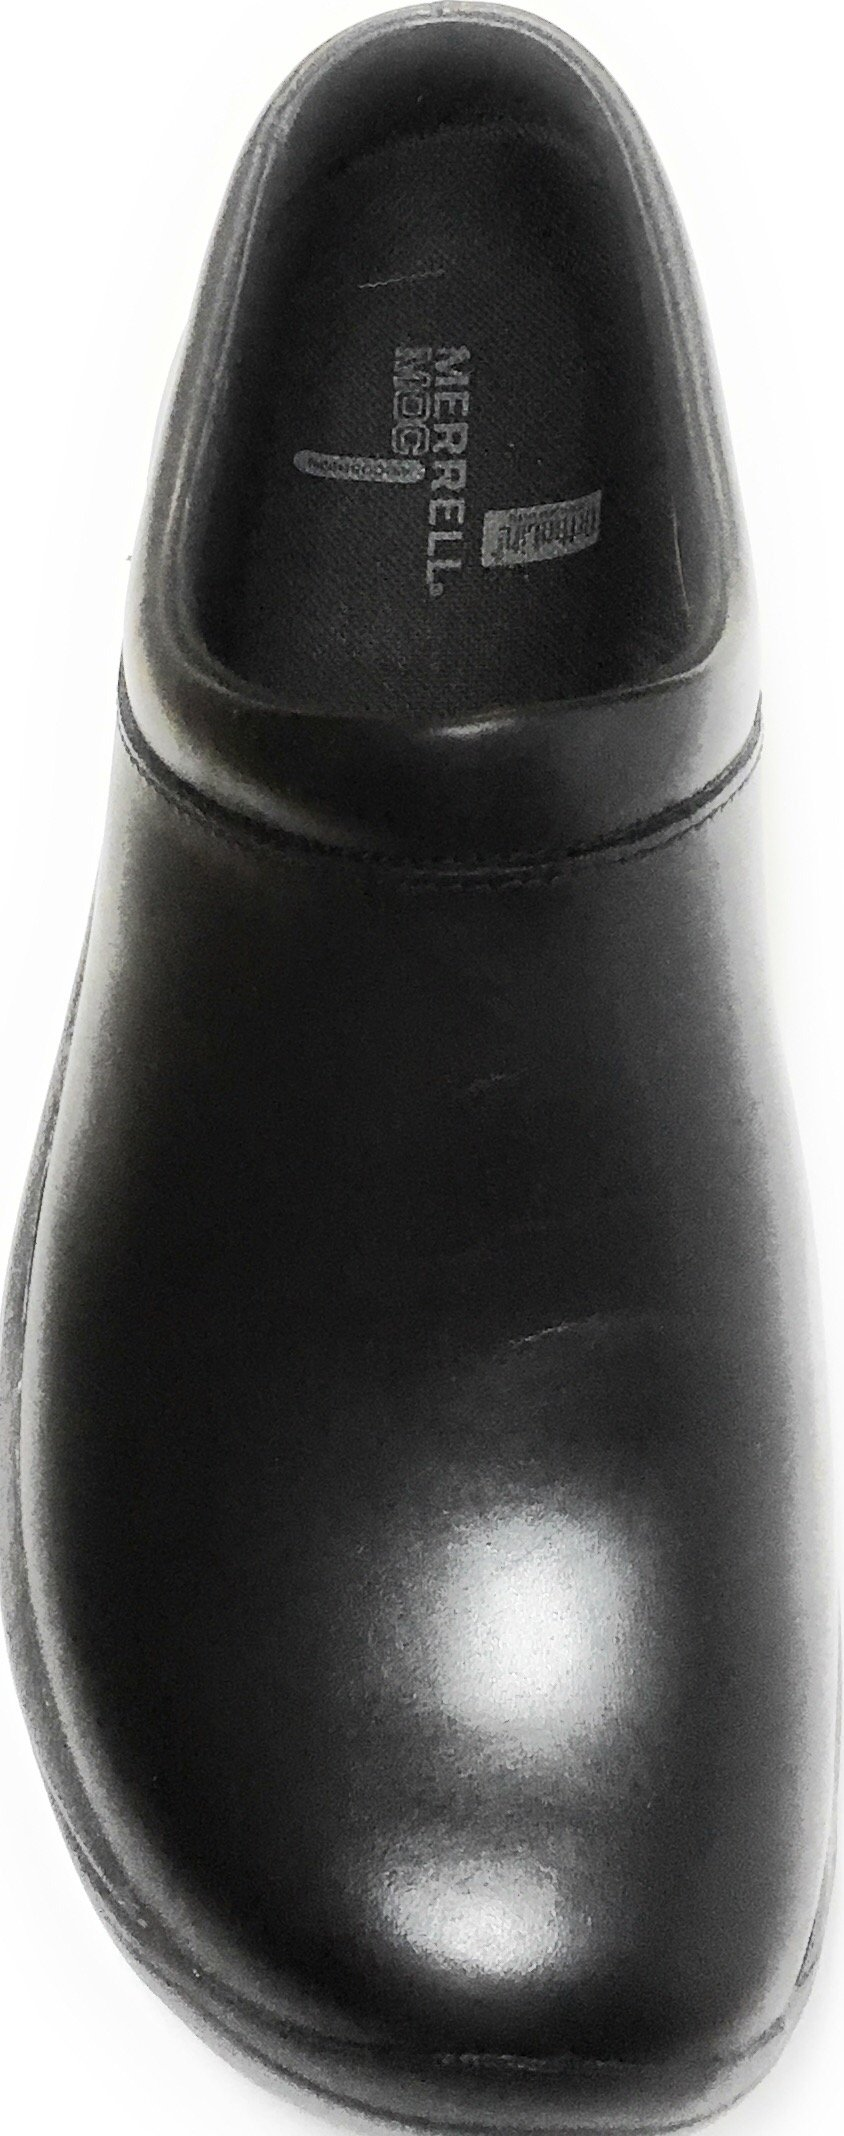 Merrell Men's Encore Gust Slip-On Shoe,Smooth Black Leather,11.5 M US